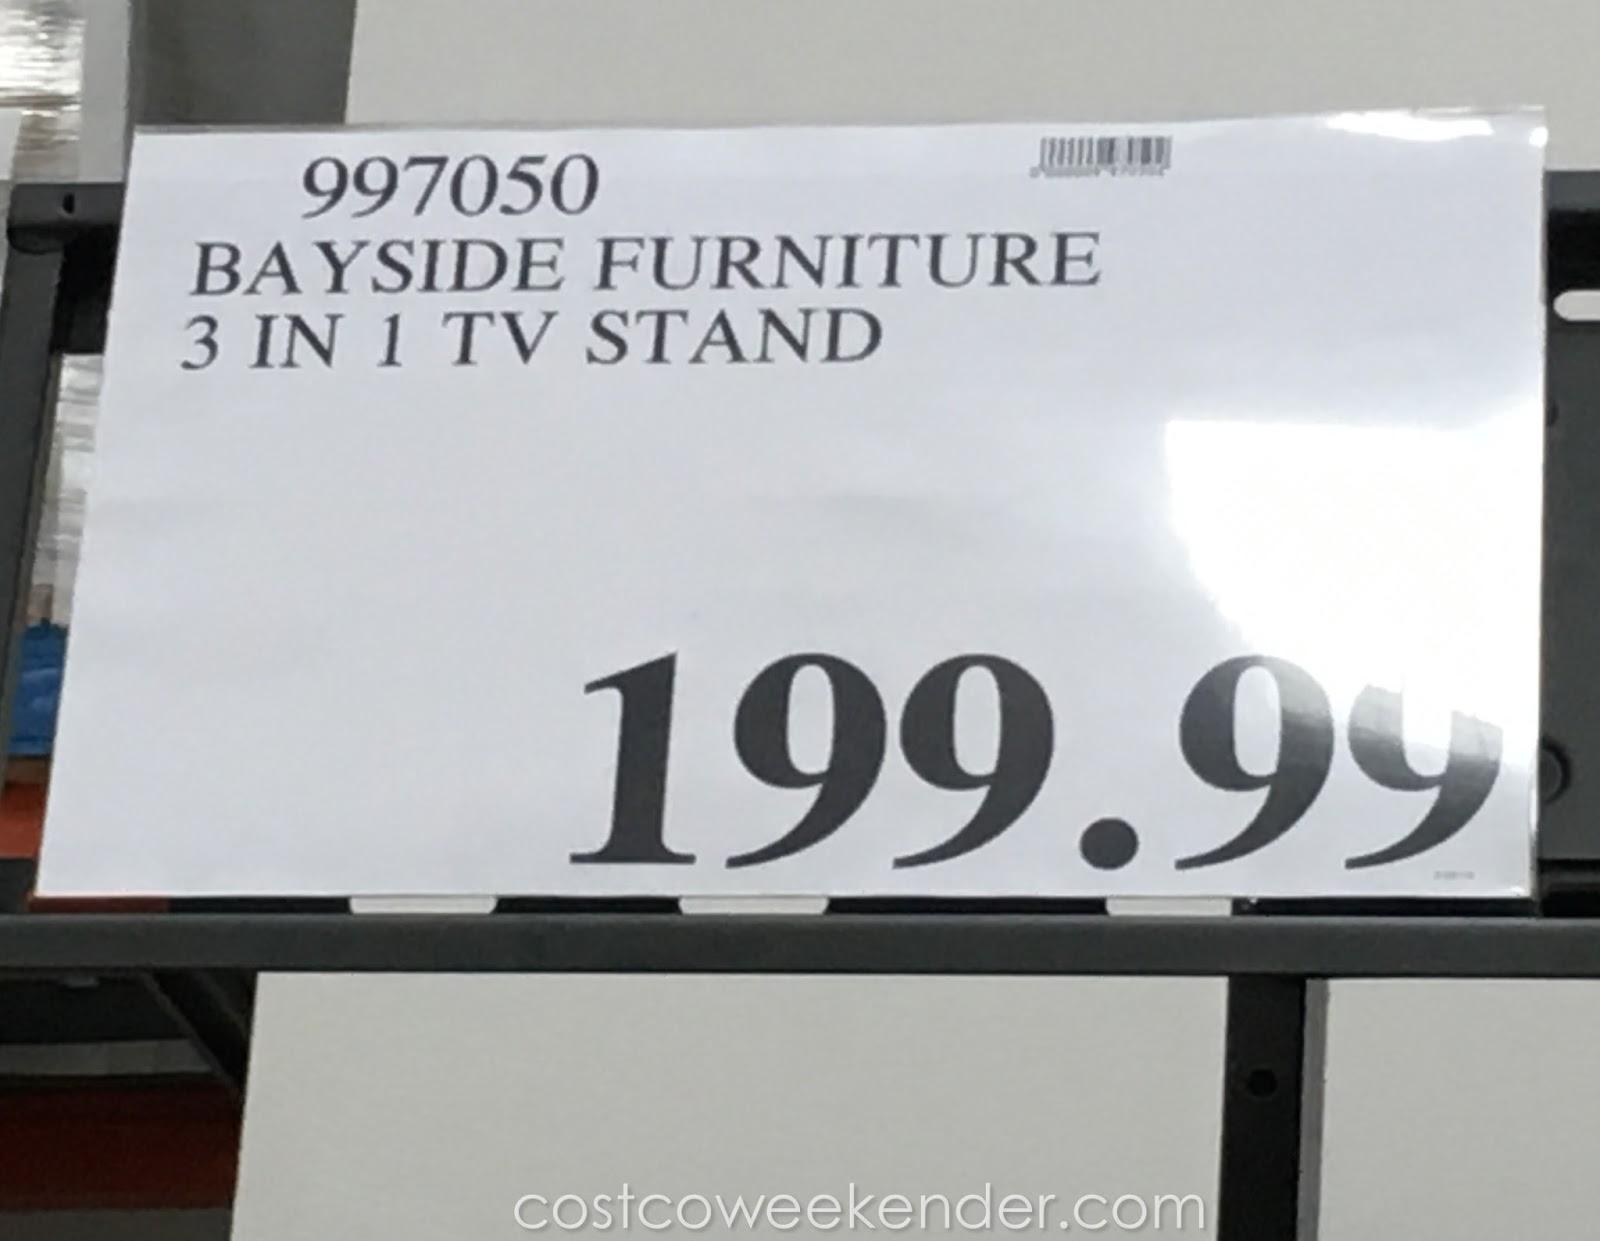 bayside furnishings 3 in 1 tv stand costco weekender. Black Bedroom Furniture Sets. Home Design Ideas